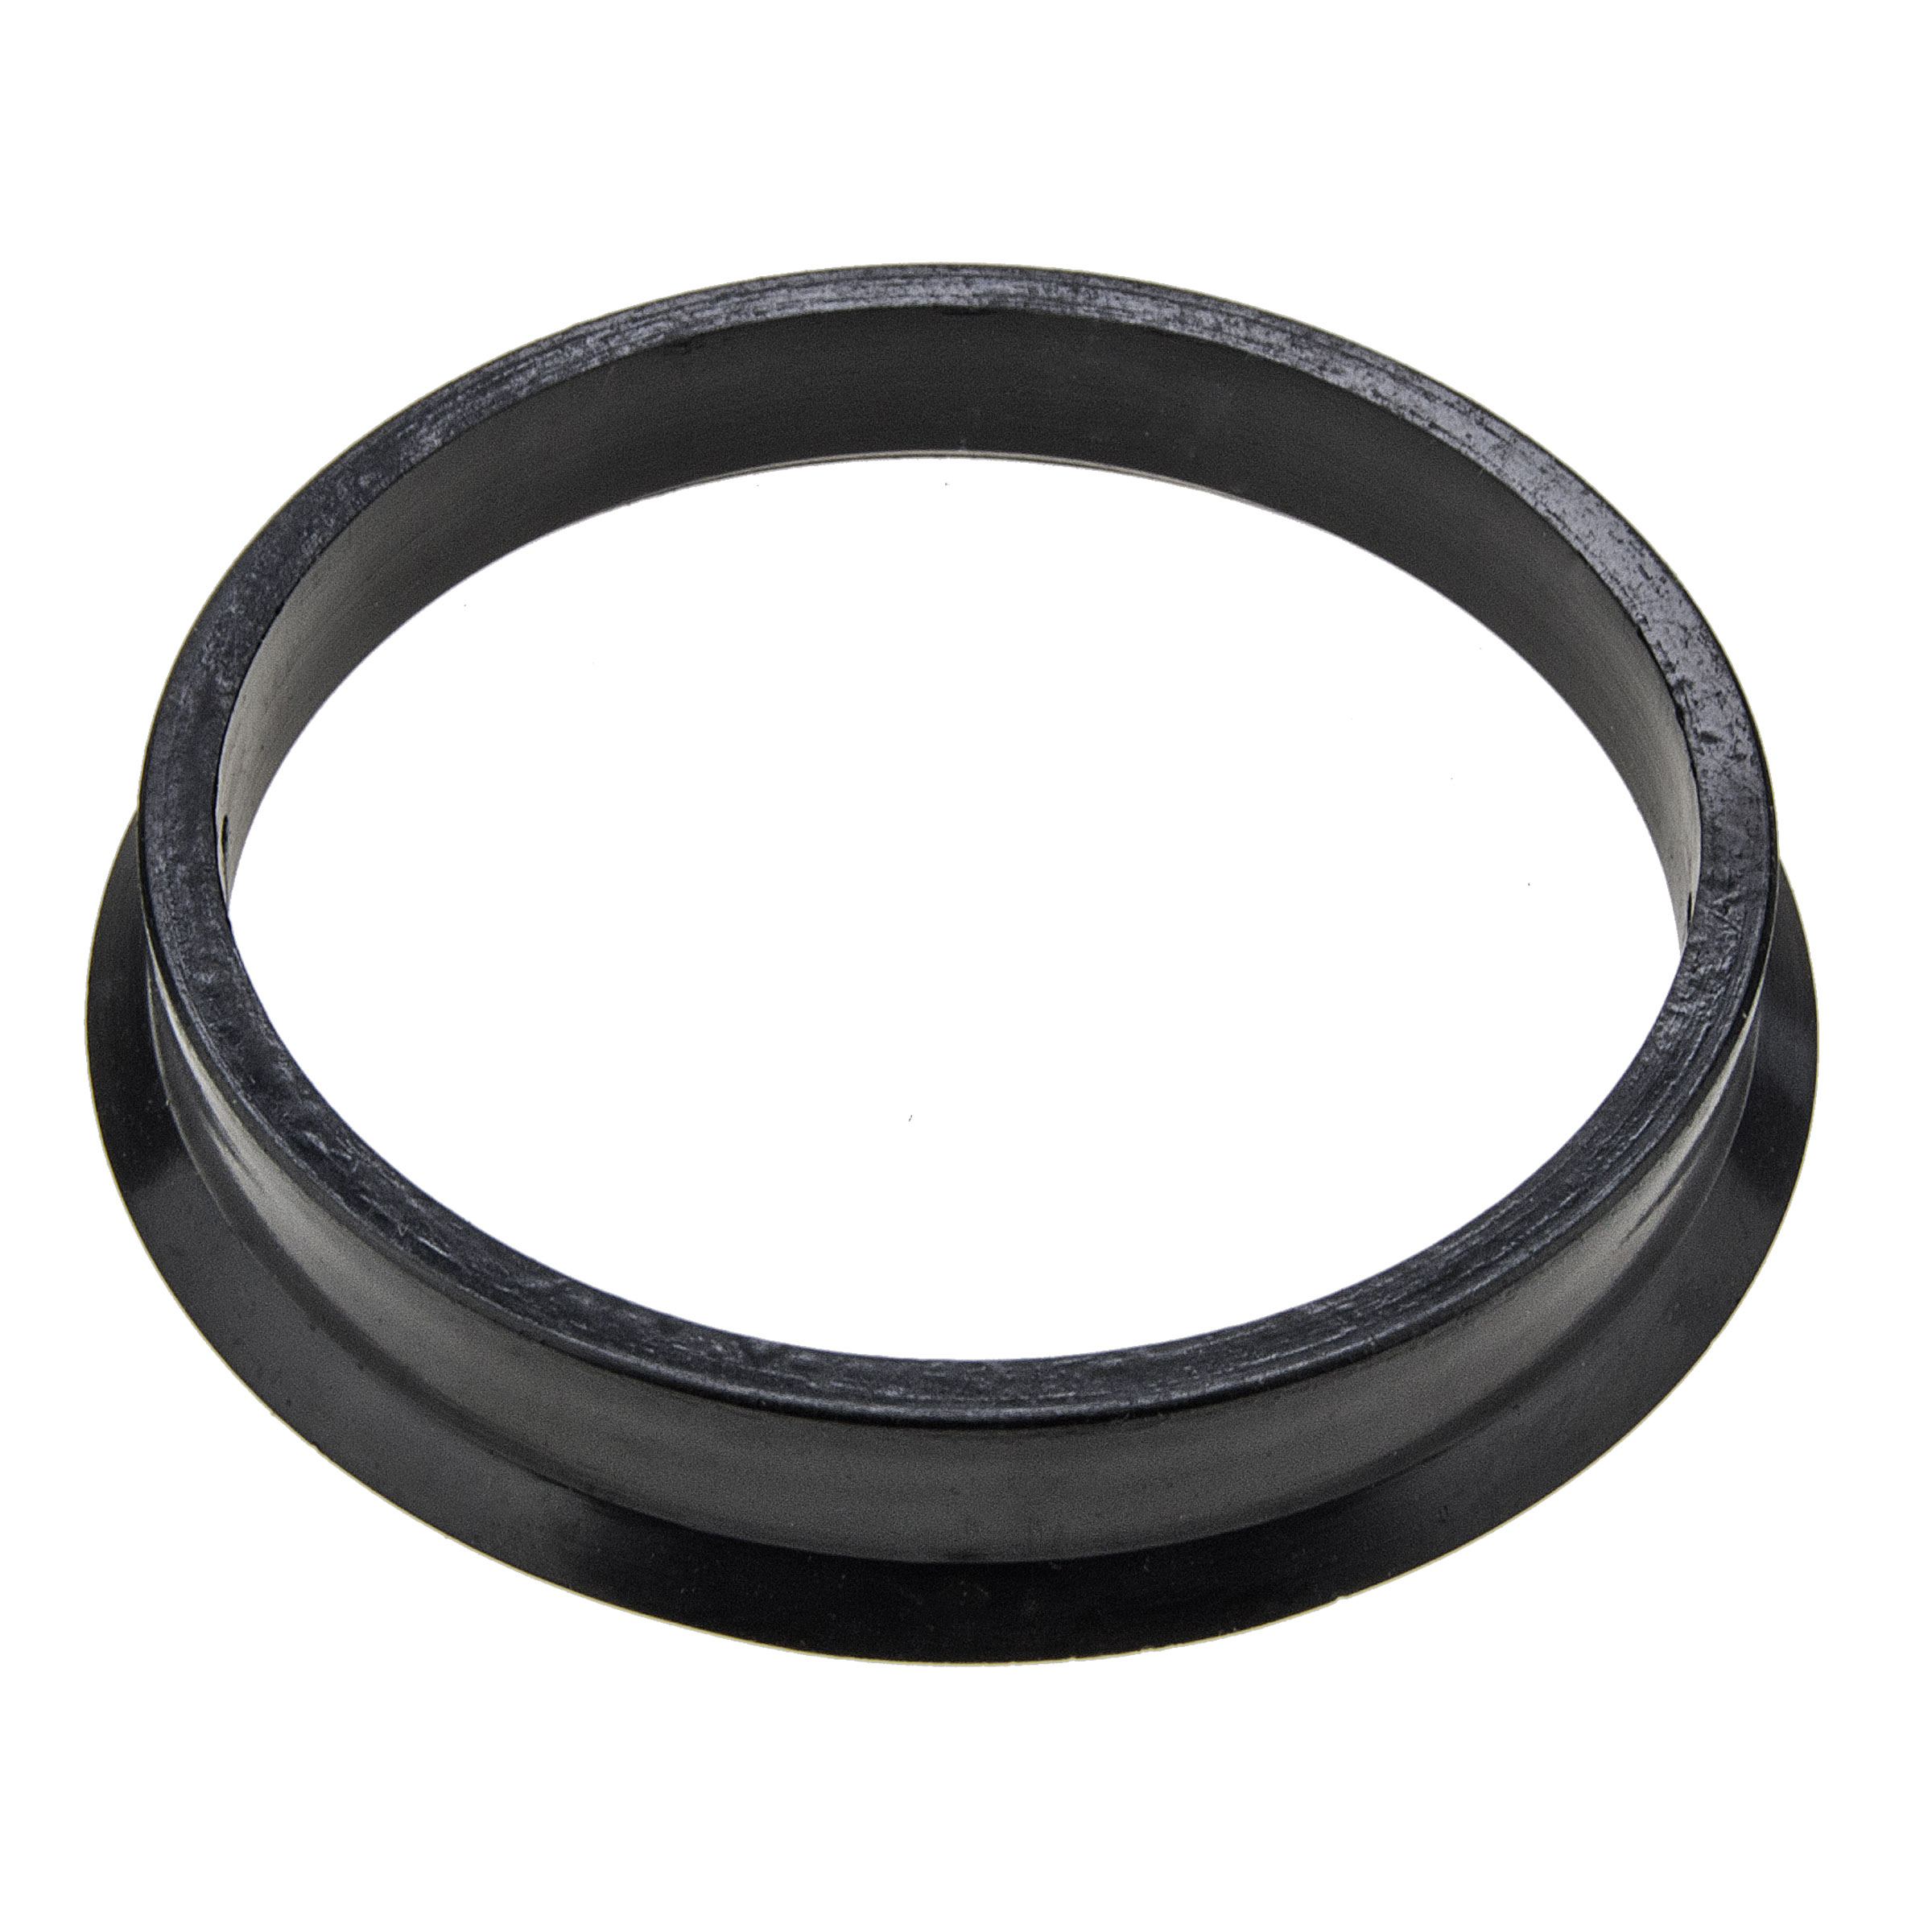 Zentrierringe Zentrierring Ring AD 70,1 mm ID 66,6 mm Original Carbonado 1 Stück